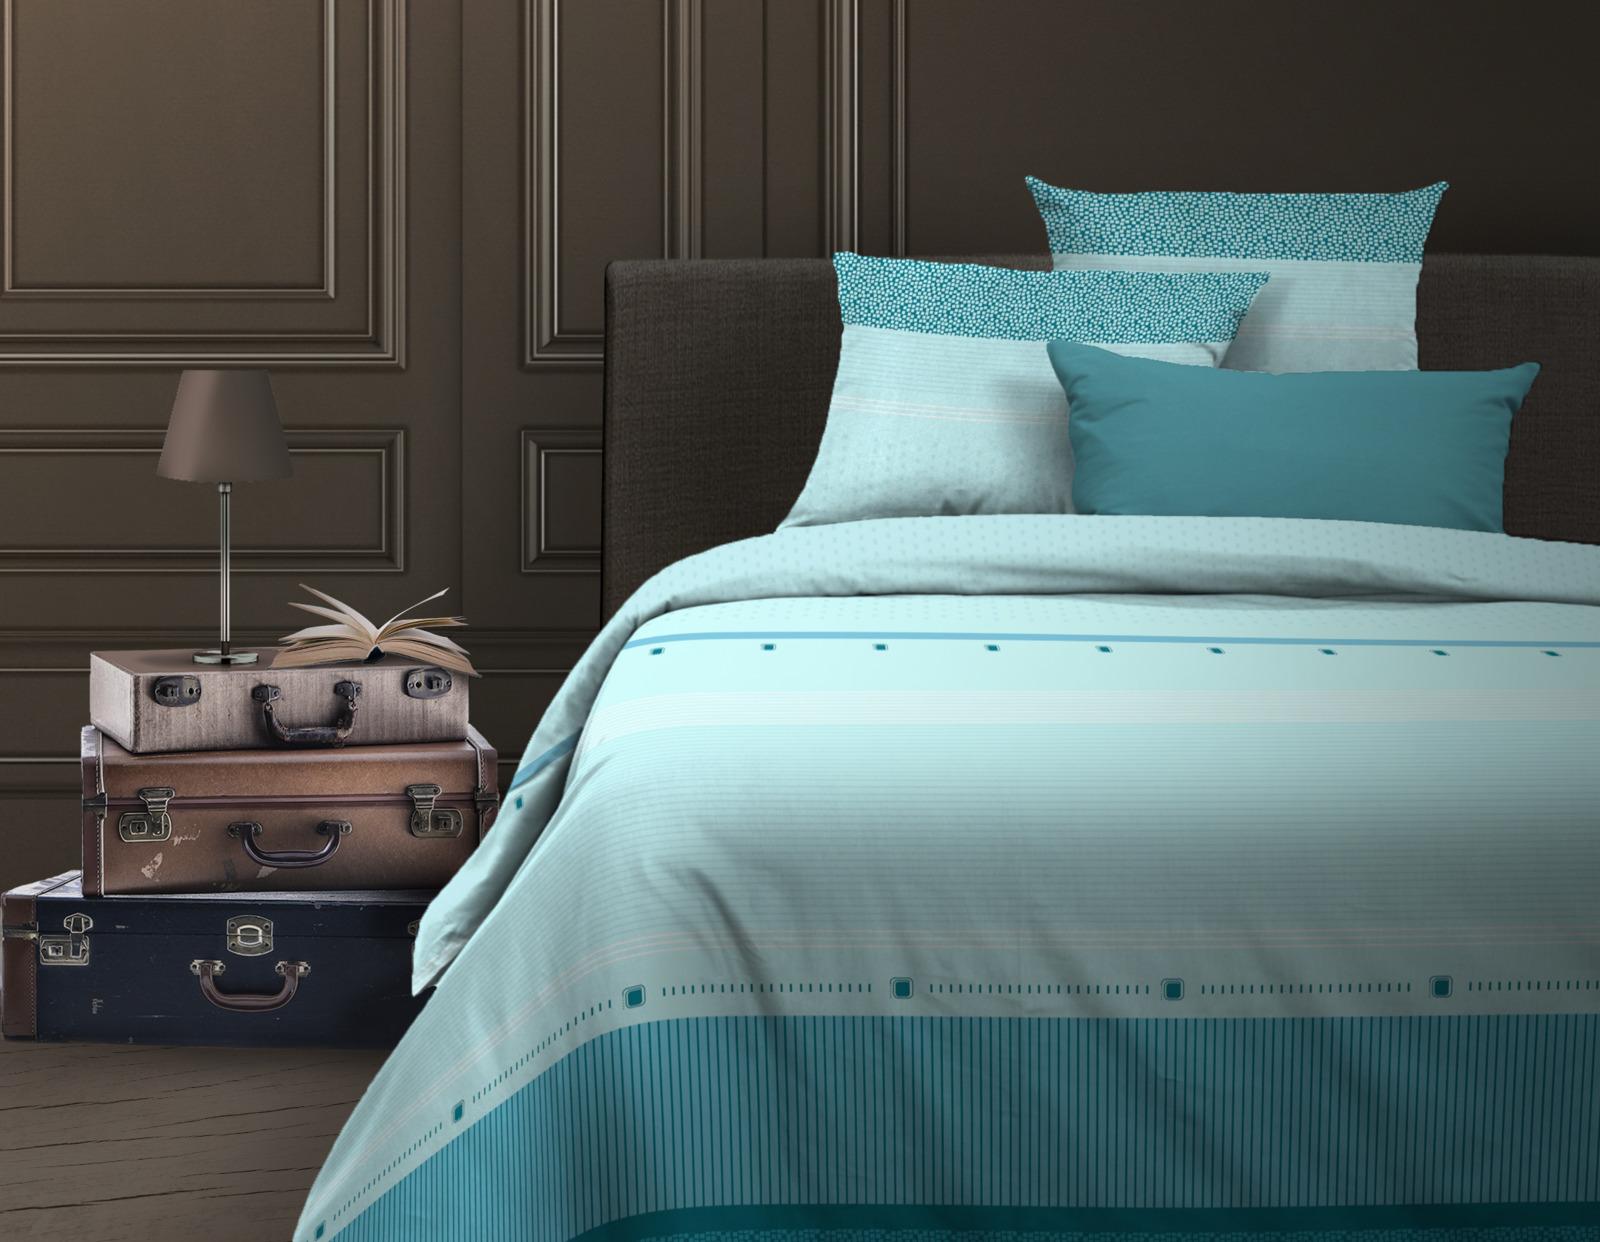 цена на Комплект постельного белья Wenge Line, 526000, евро, наволочки 70х70 см